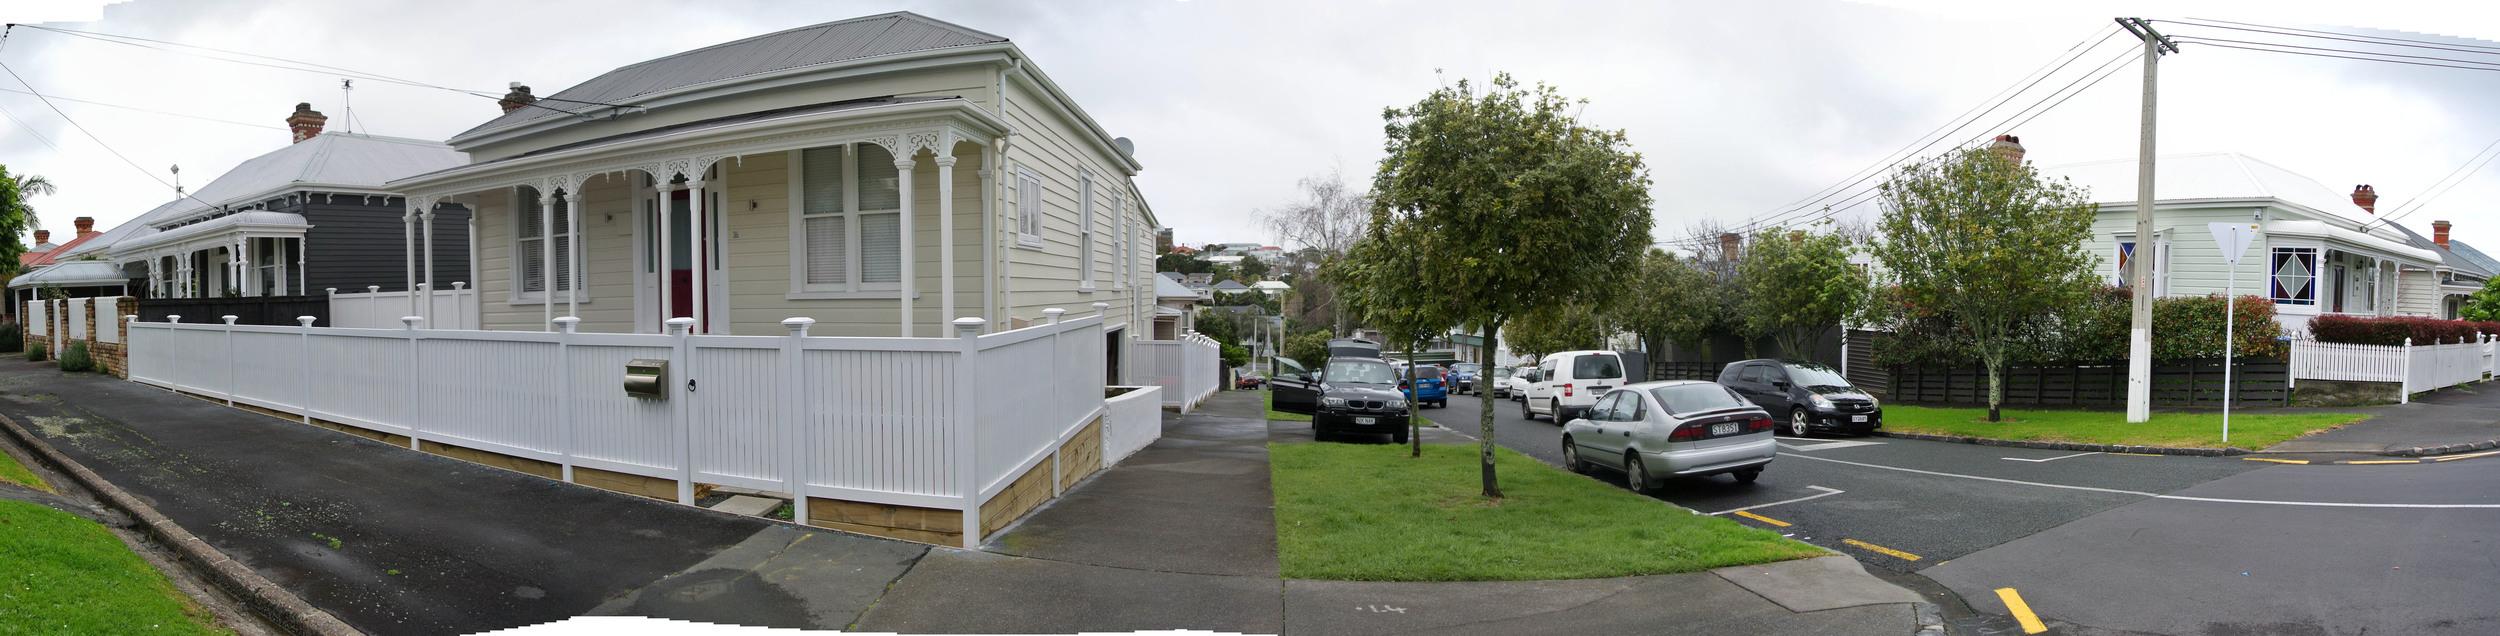 Murdoch Road Panorama.jpg